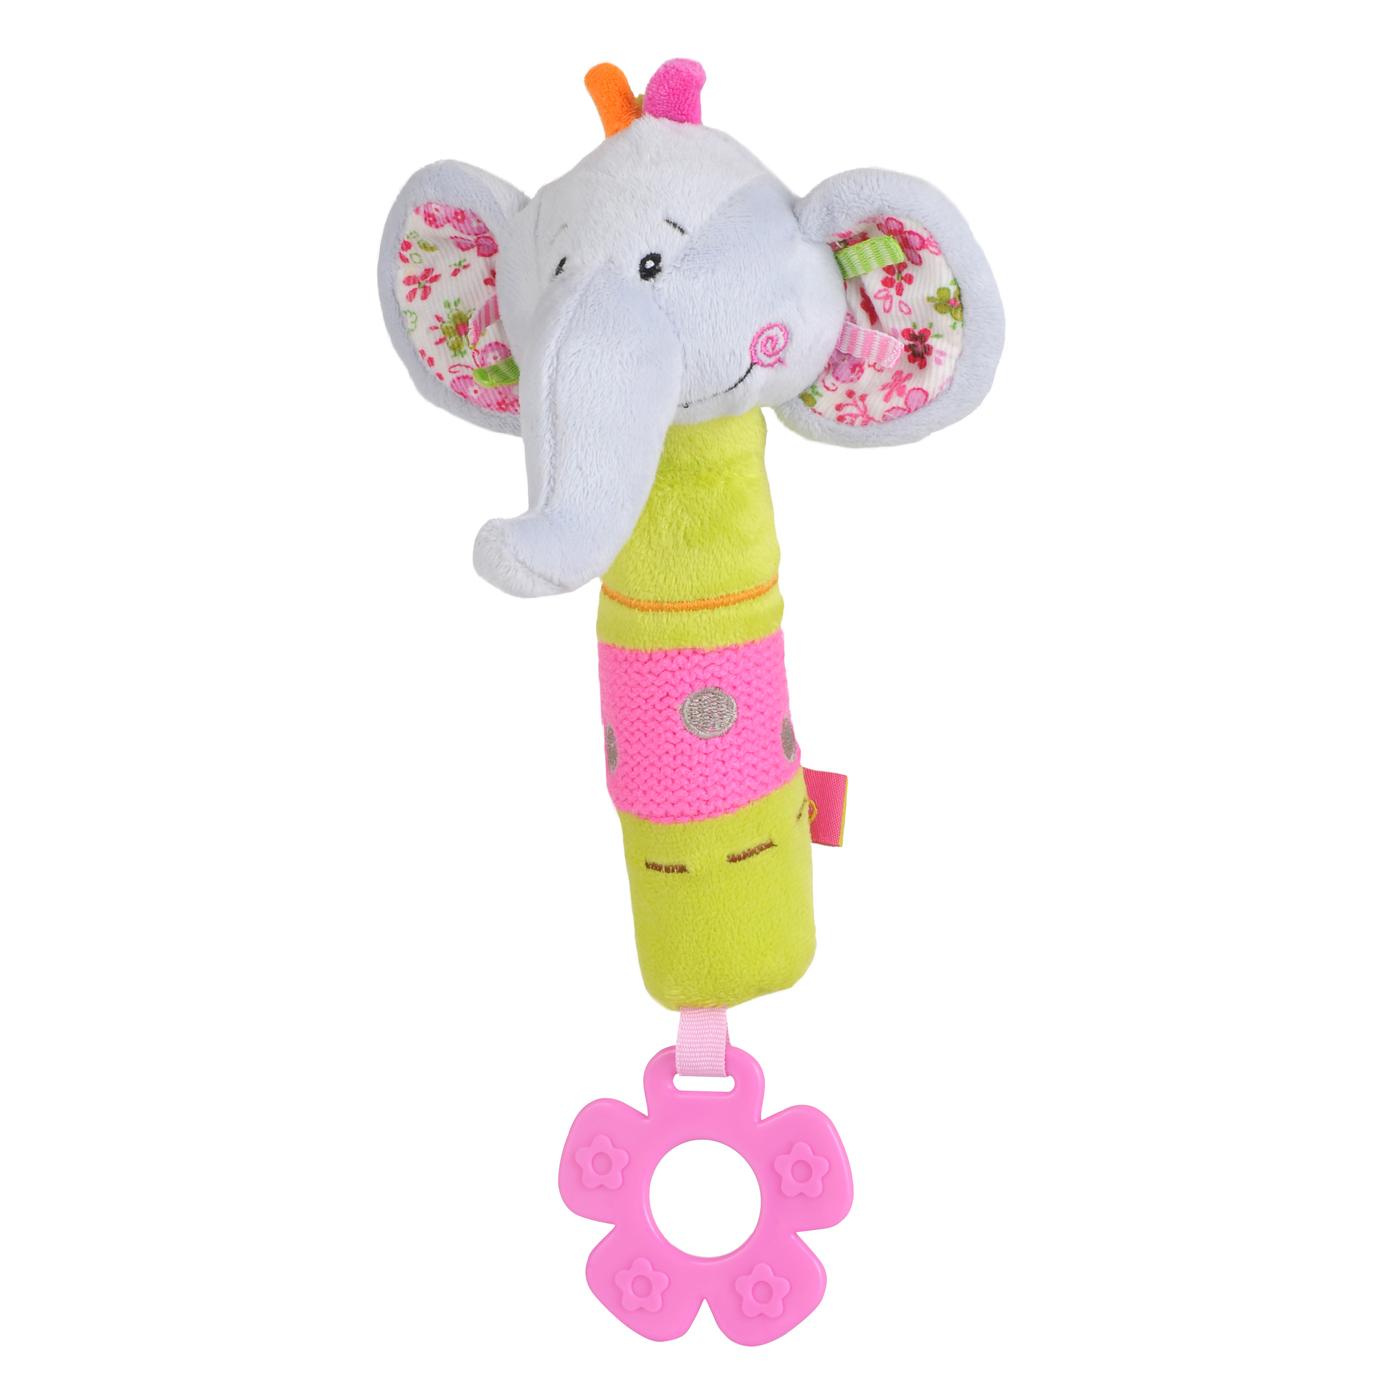 1193 BabyOno igračka skvičavac sa grickalicom slonić